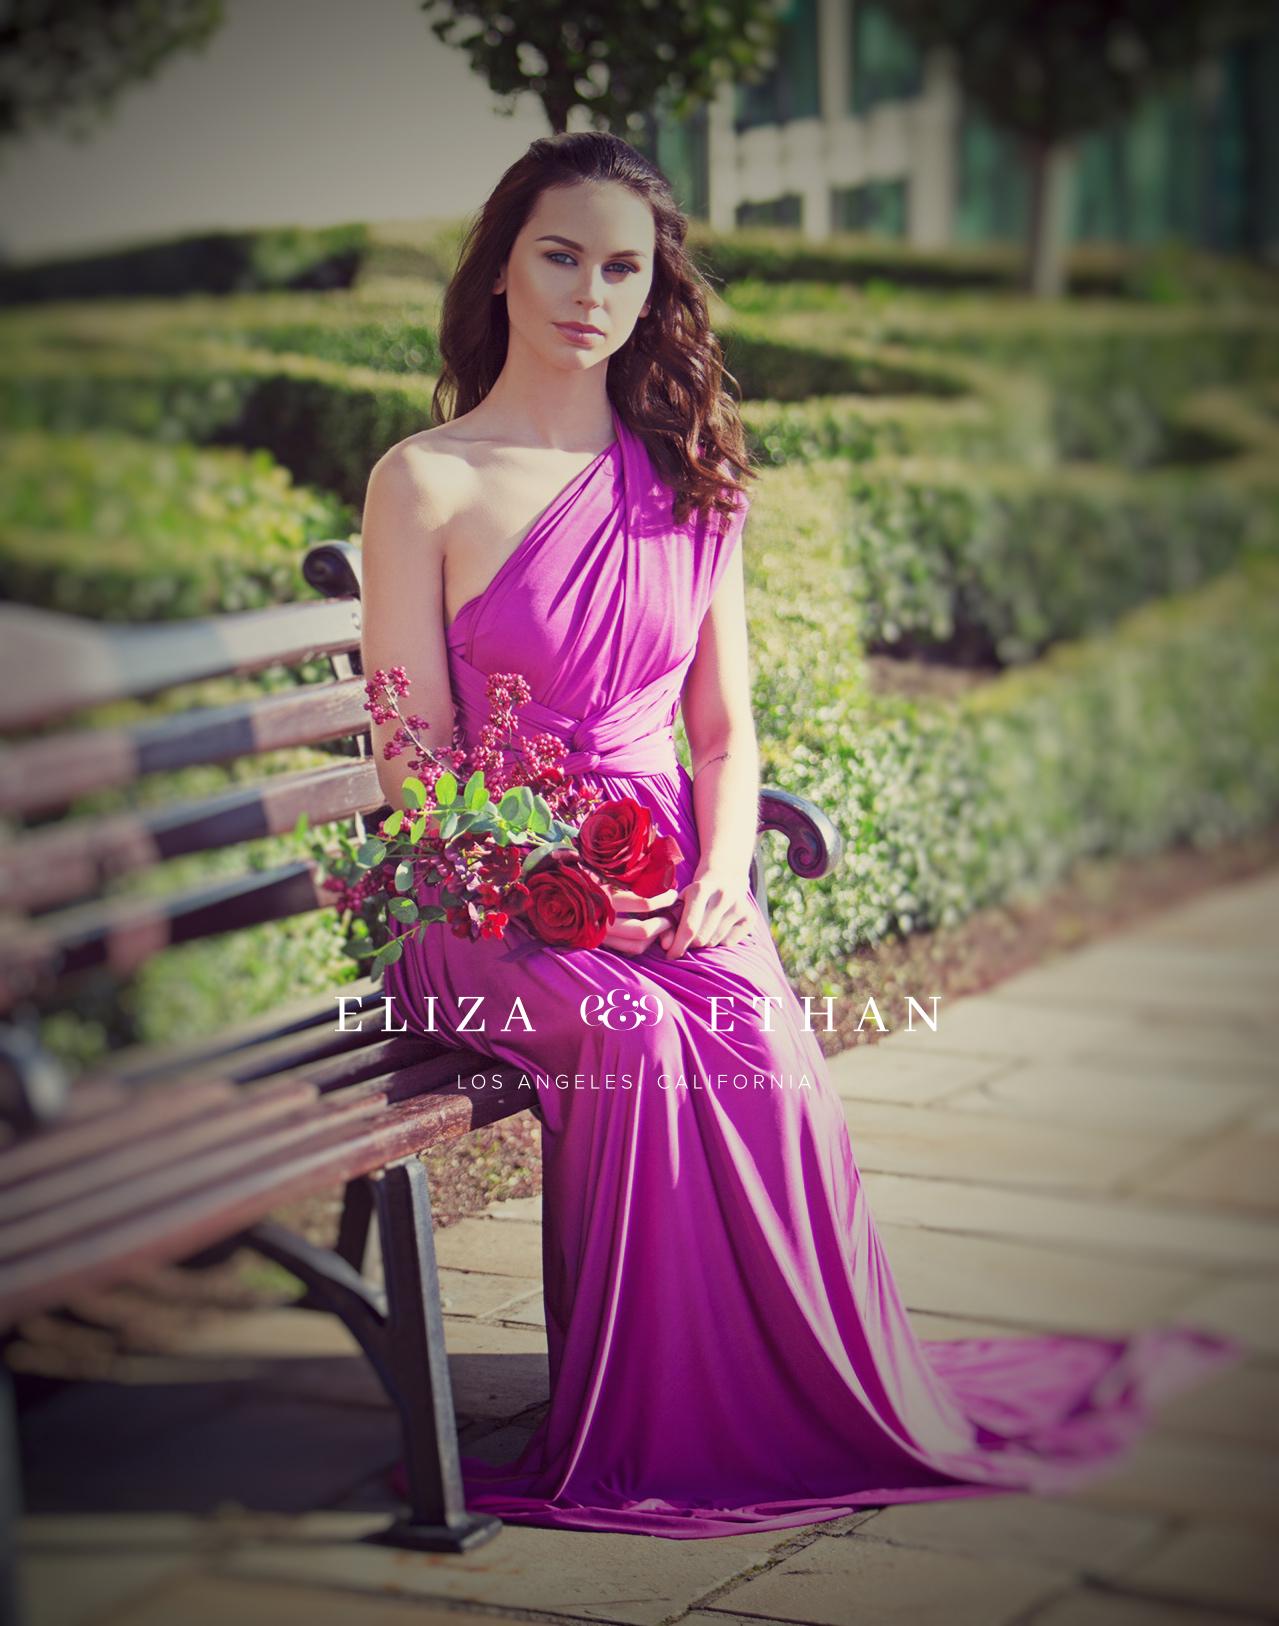 Eliza & Ethan multi way wrap dress purple bridesmaids dress